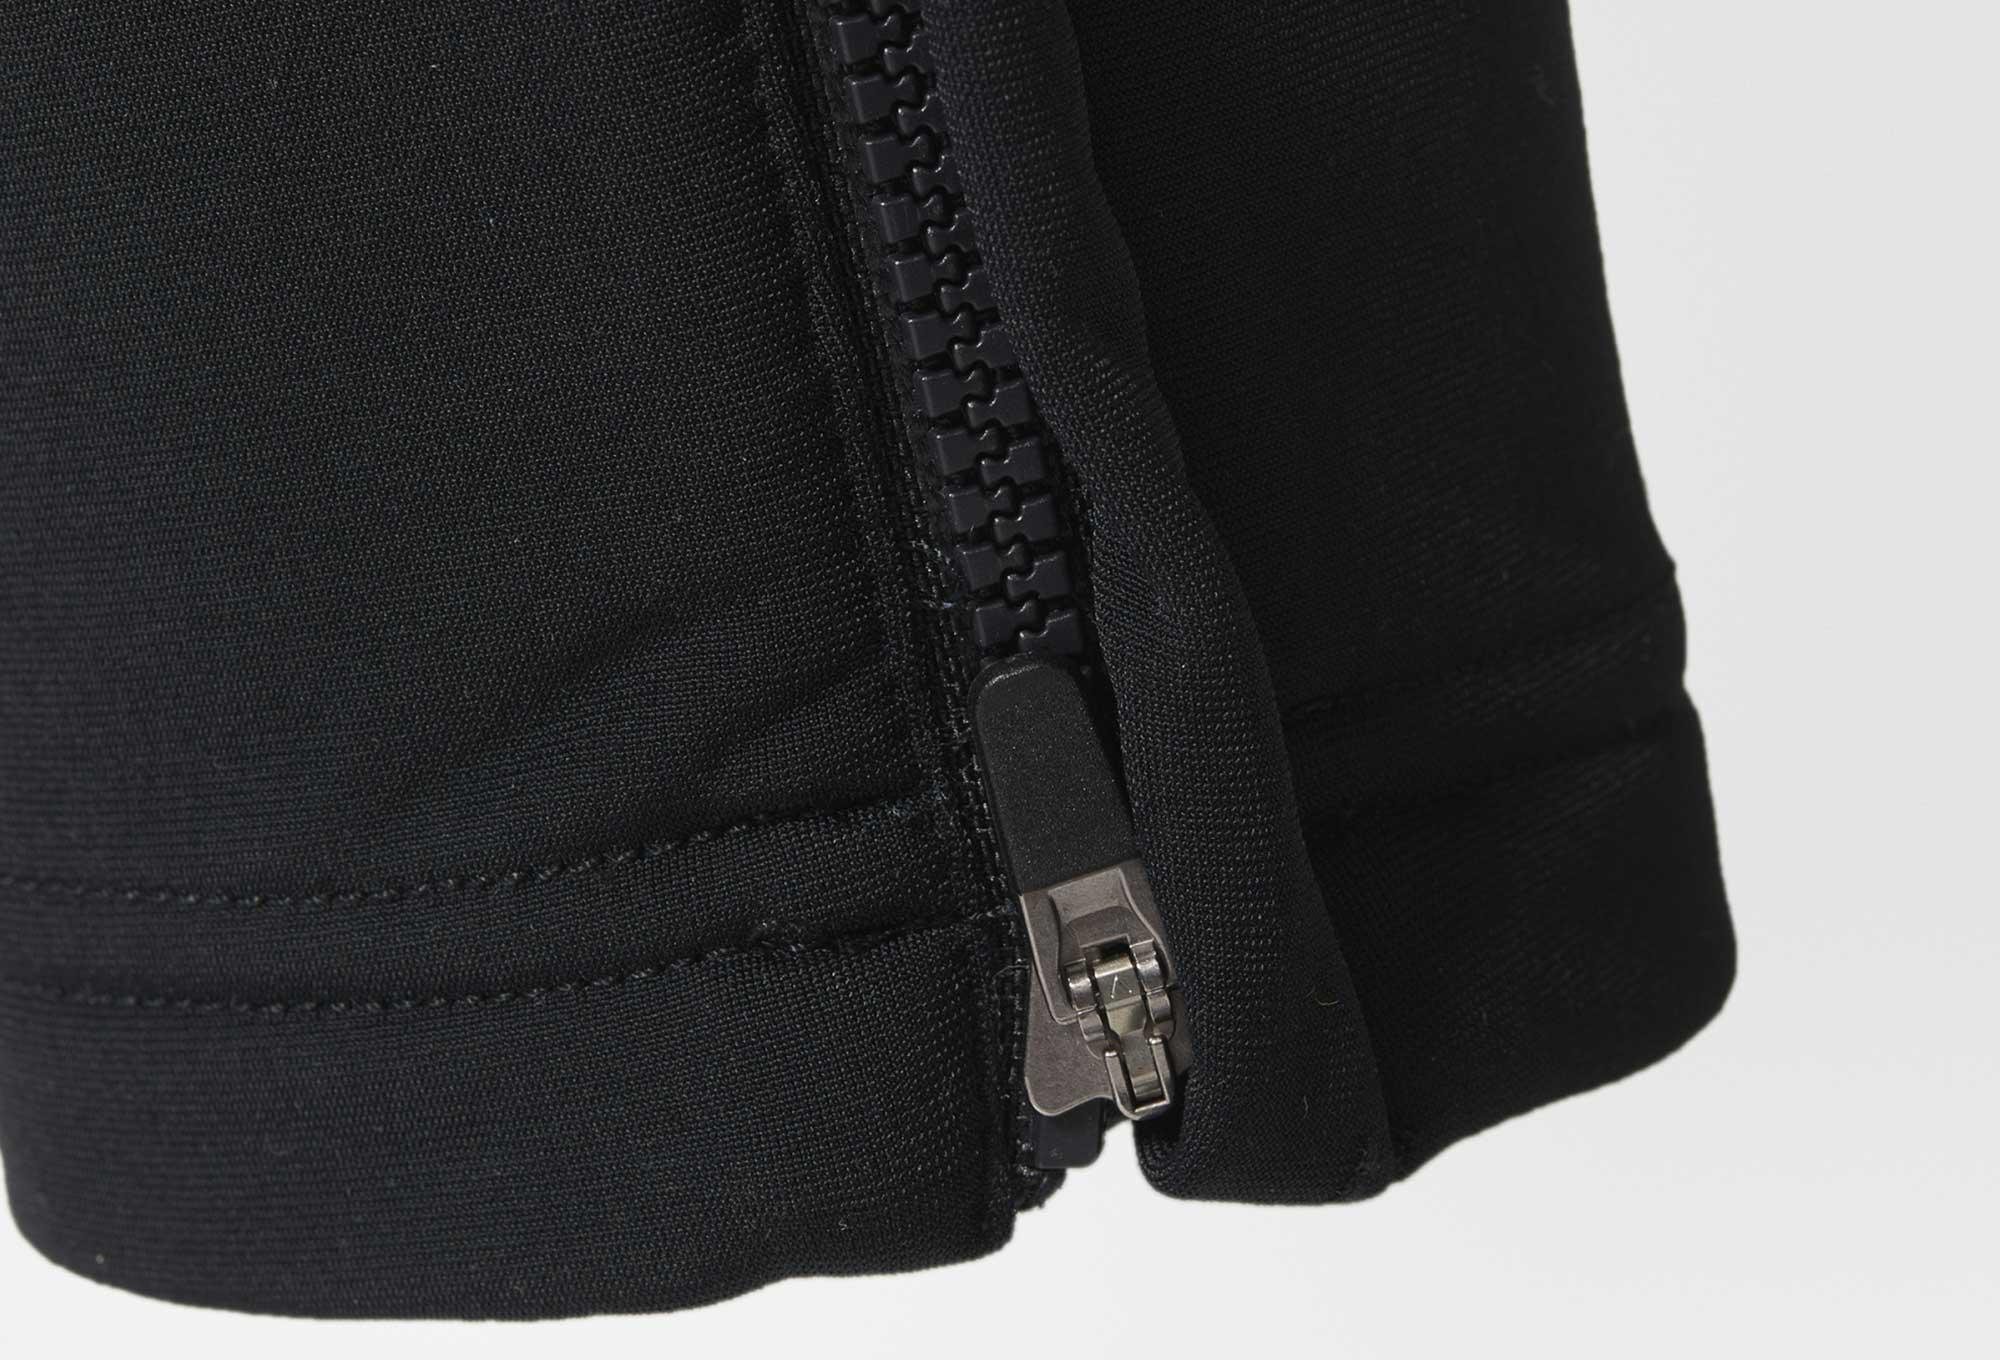 knee noir infinity warm cycling adidas warmers sQrthd